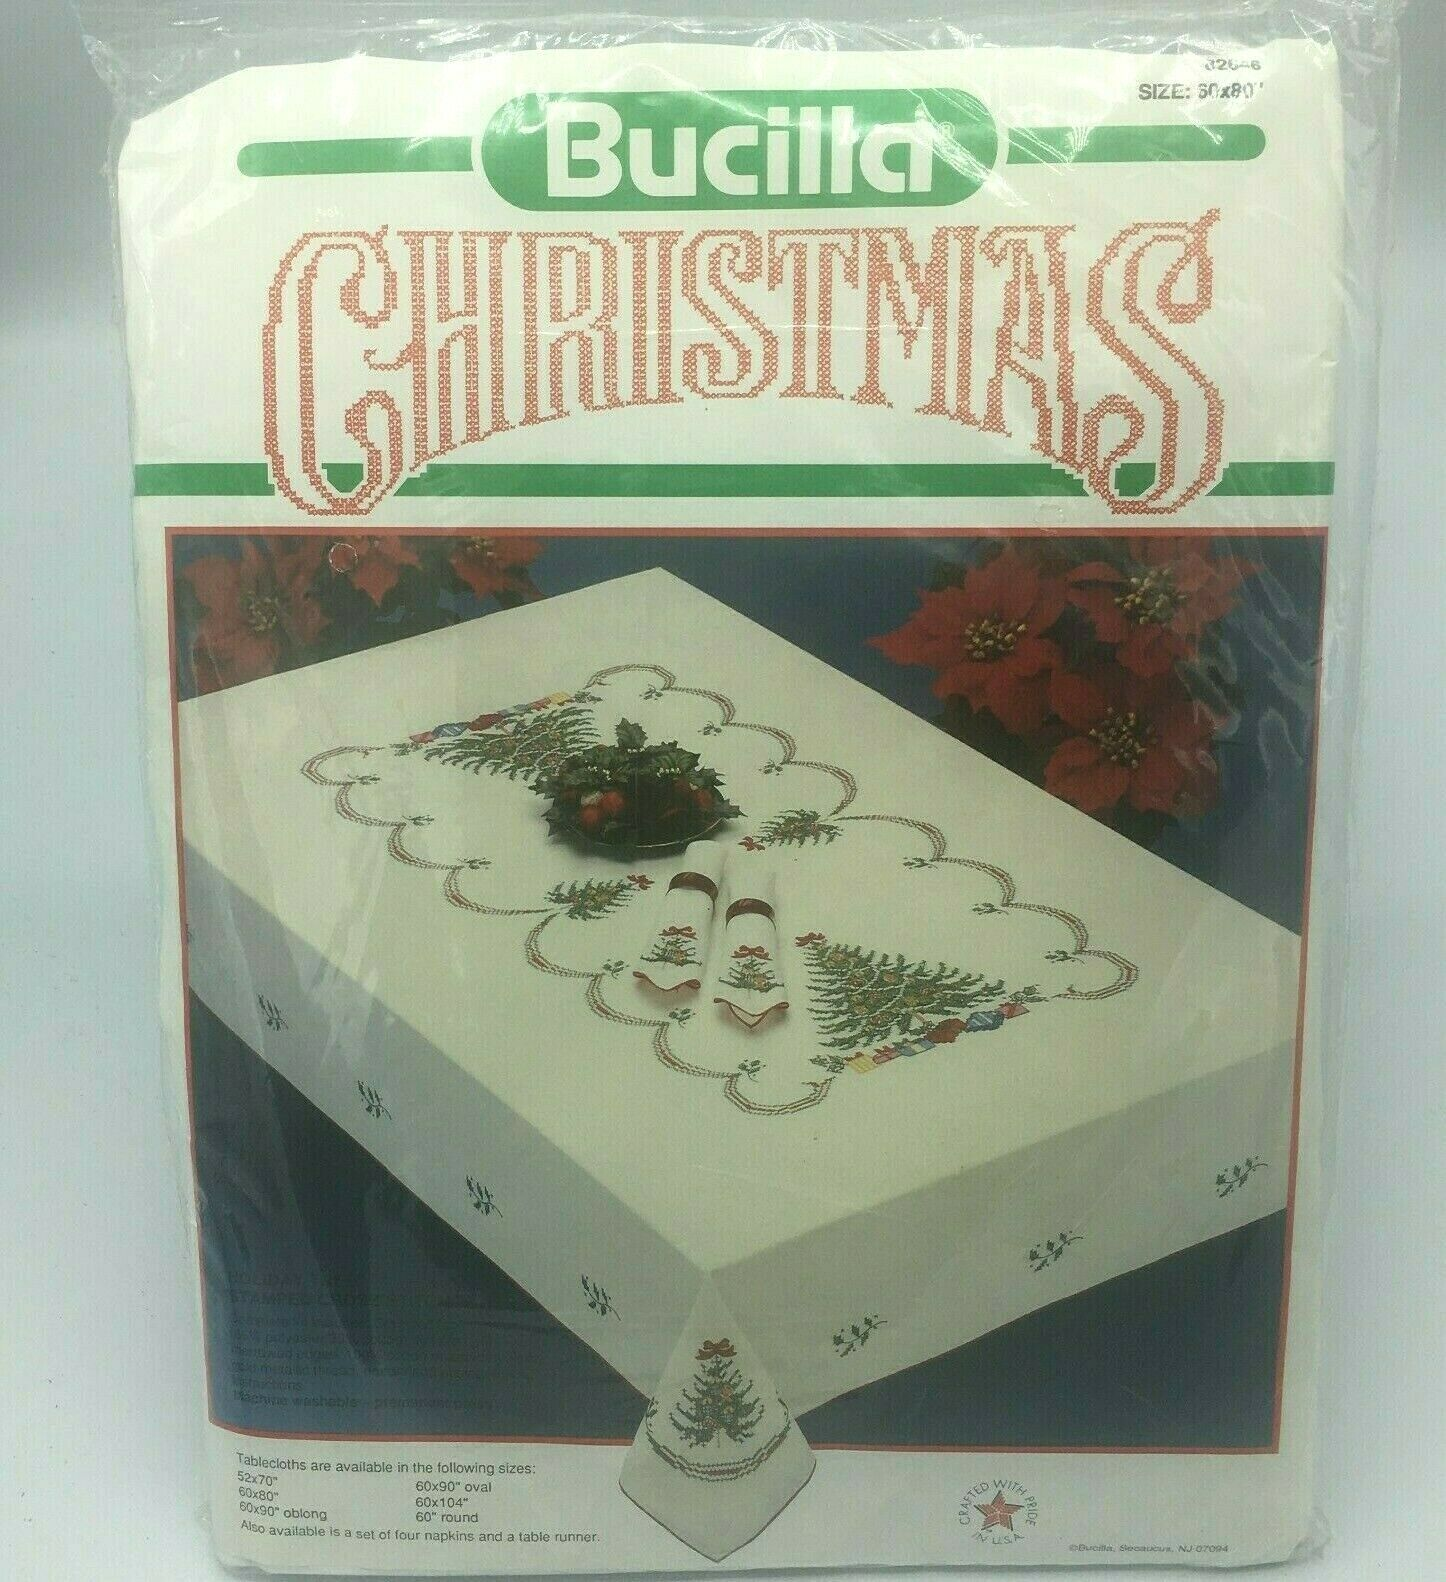 "Bucilla Christmas Cross Stitch Tablecloth 60"" x 80"" 82646 NE"